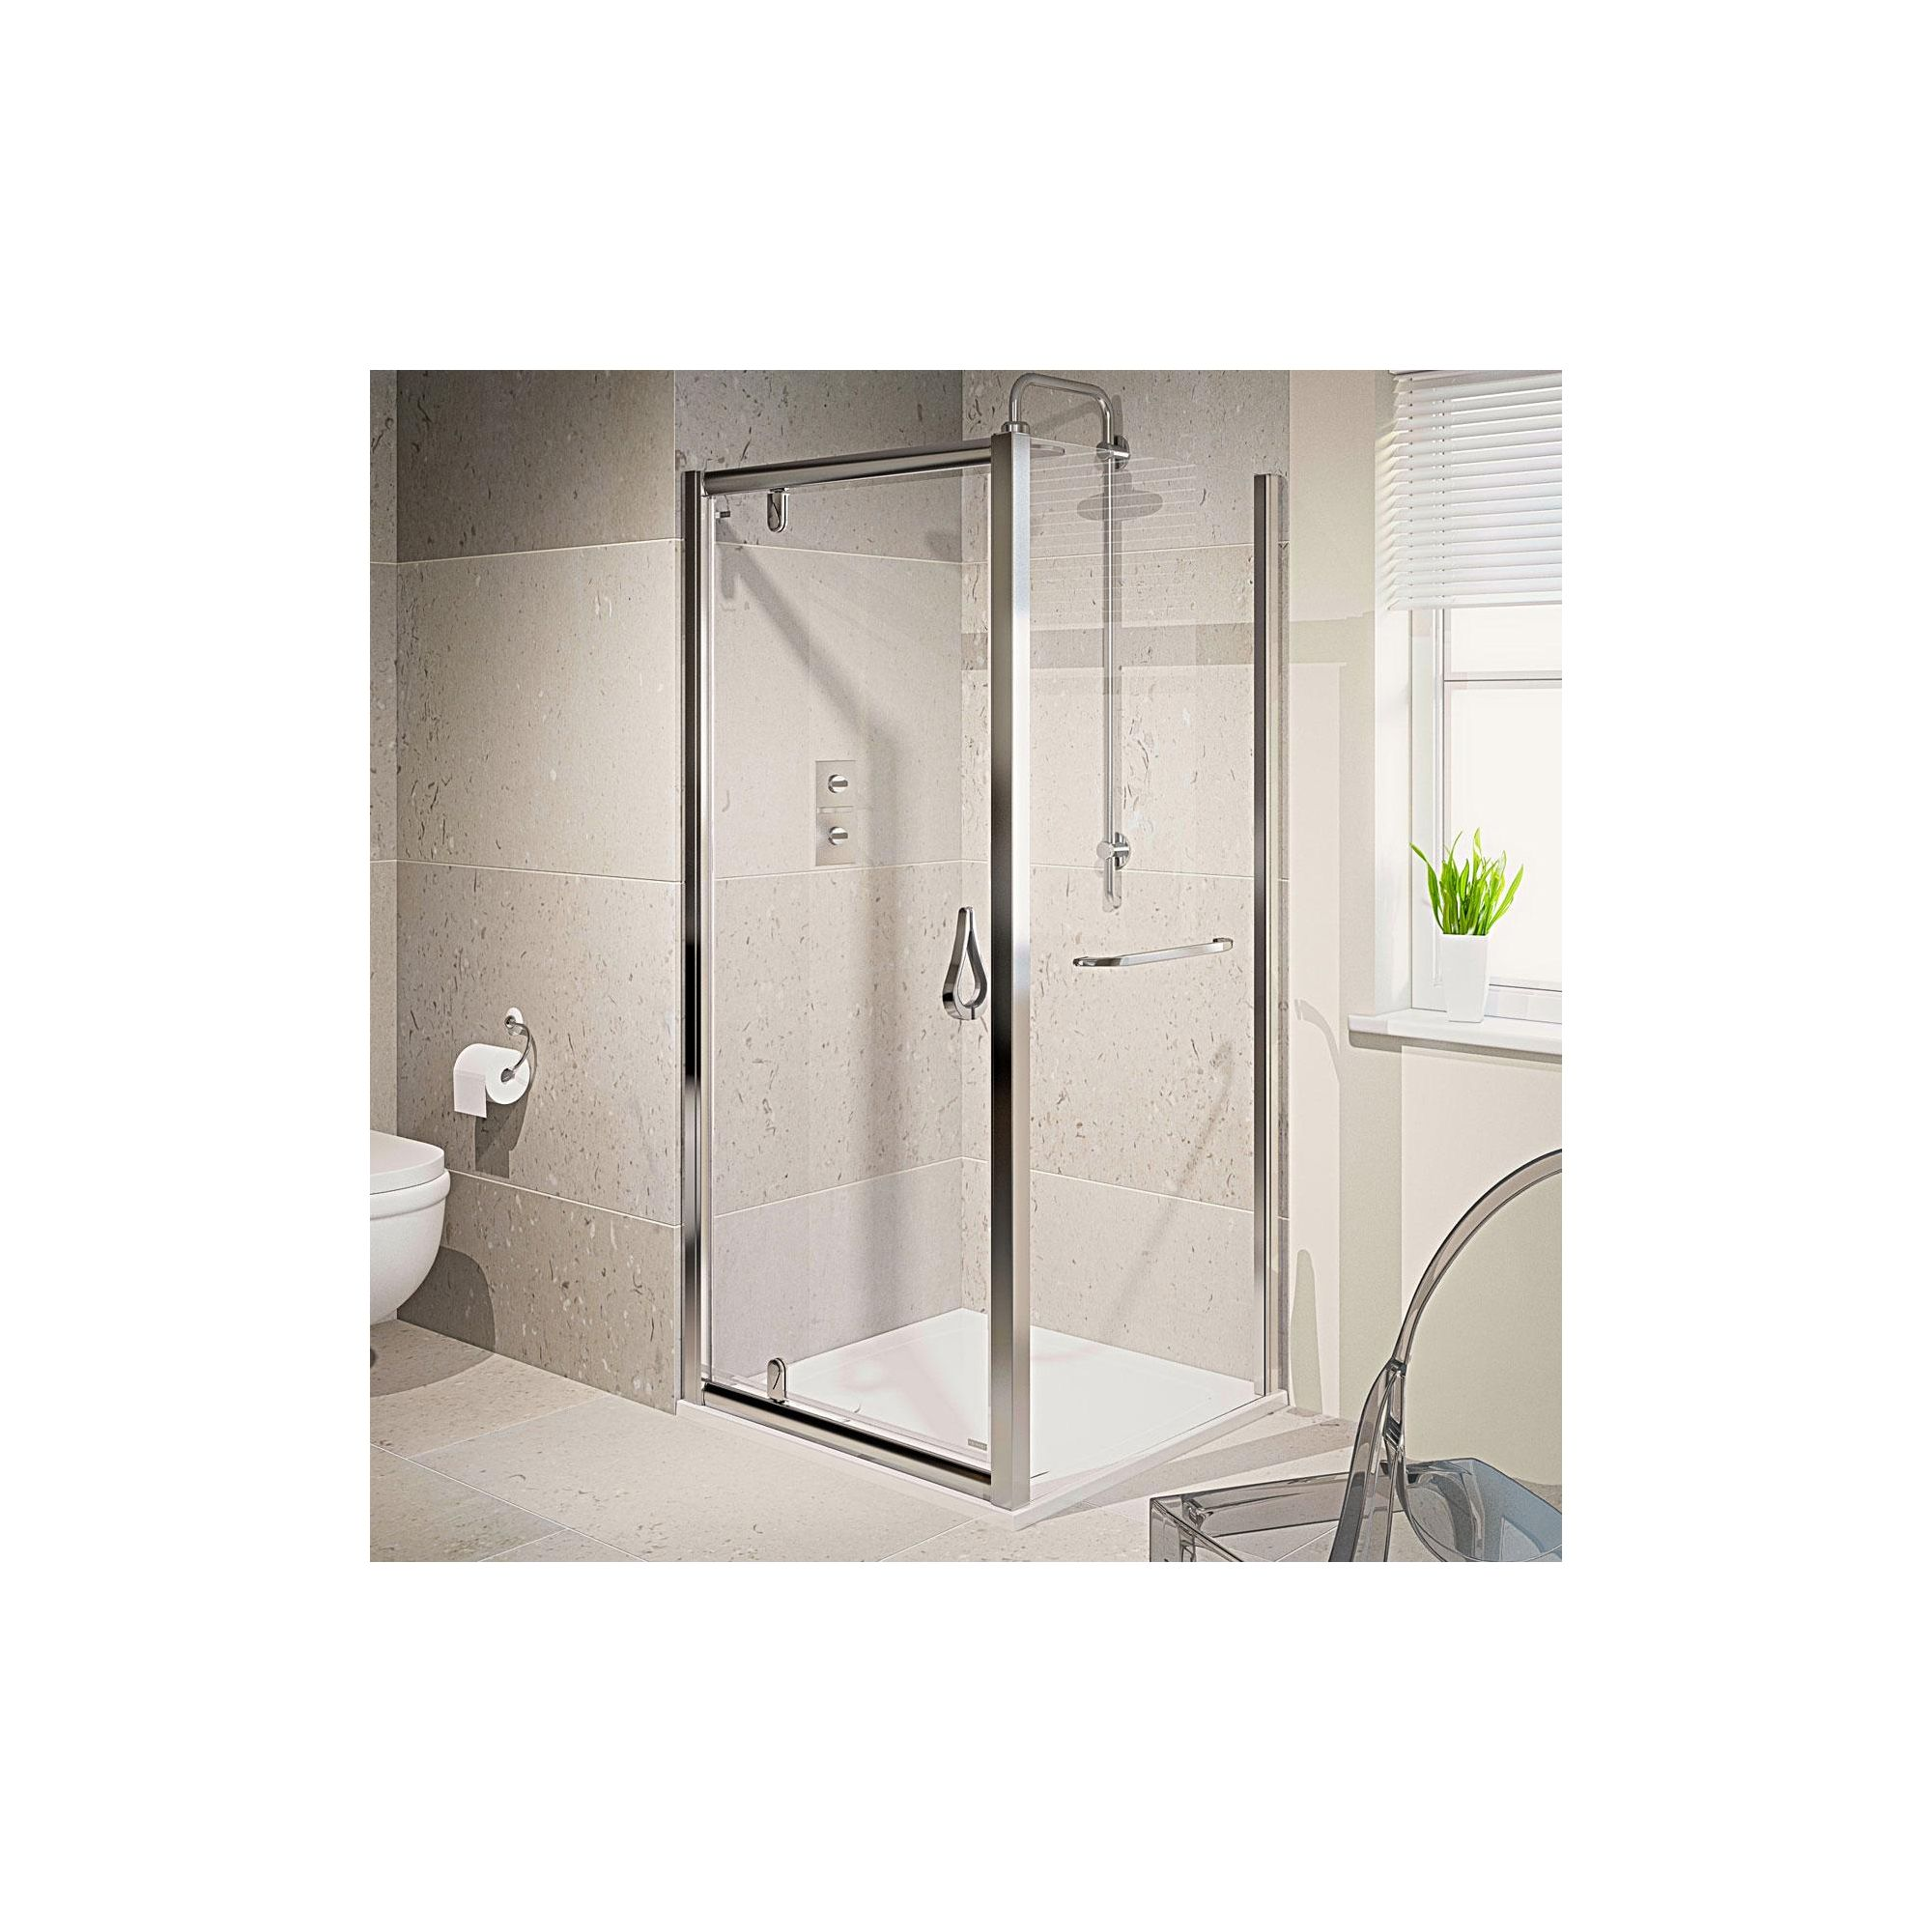 Aqualux AQUA6 Pivot Shower Door, 800mm Wide, Polished Silver Frame, 6mm Glass at Tesco Direct